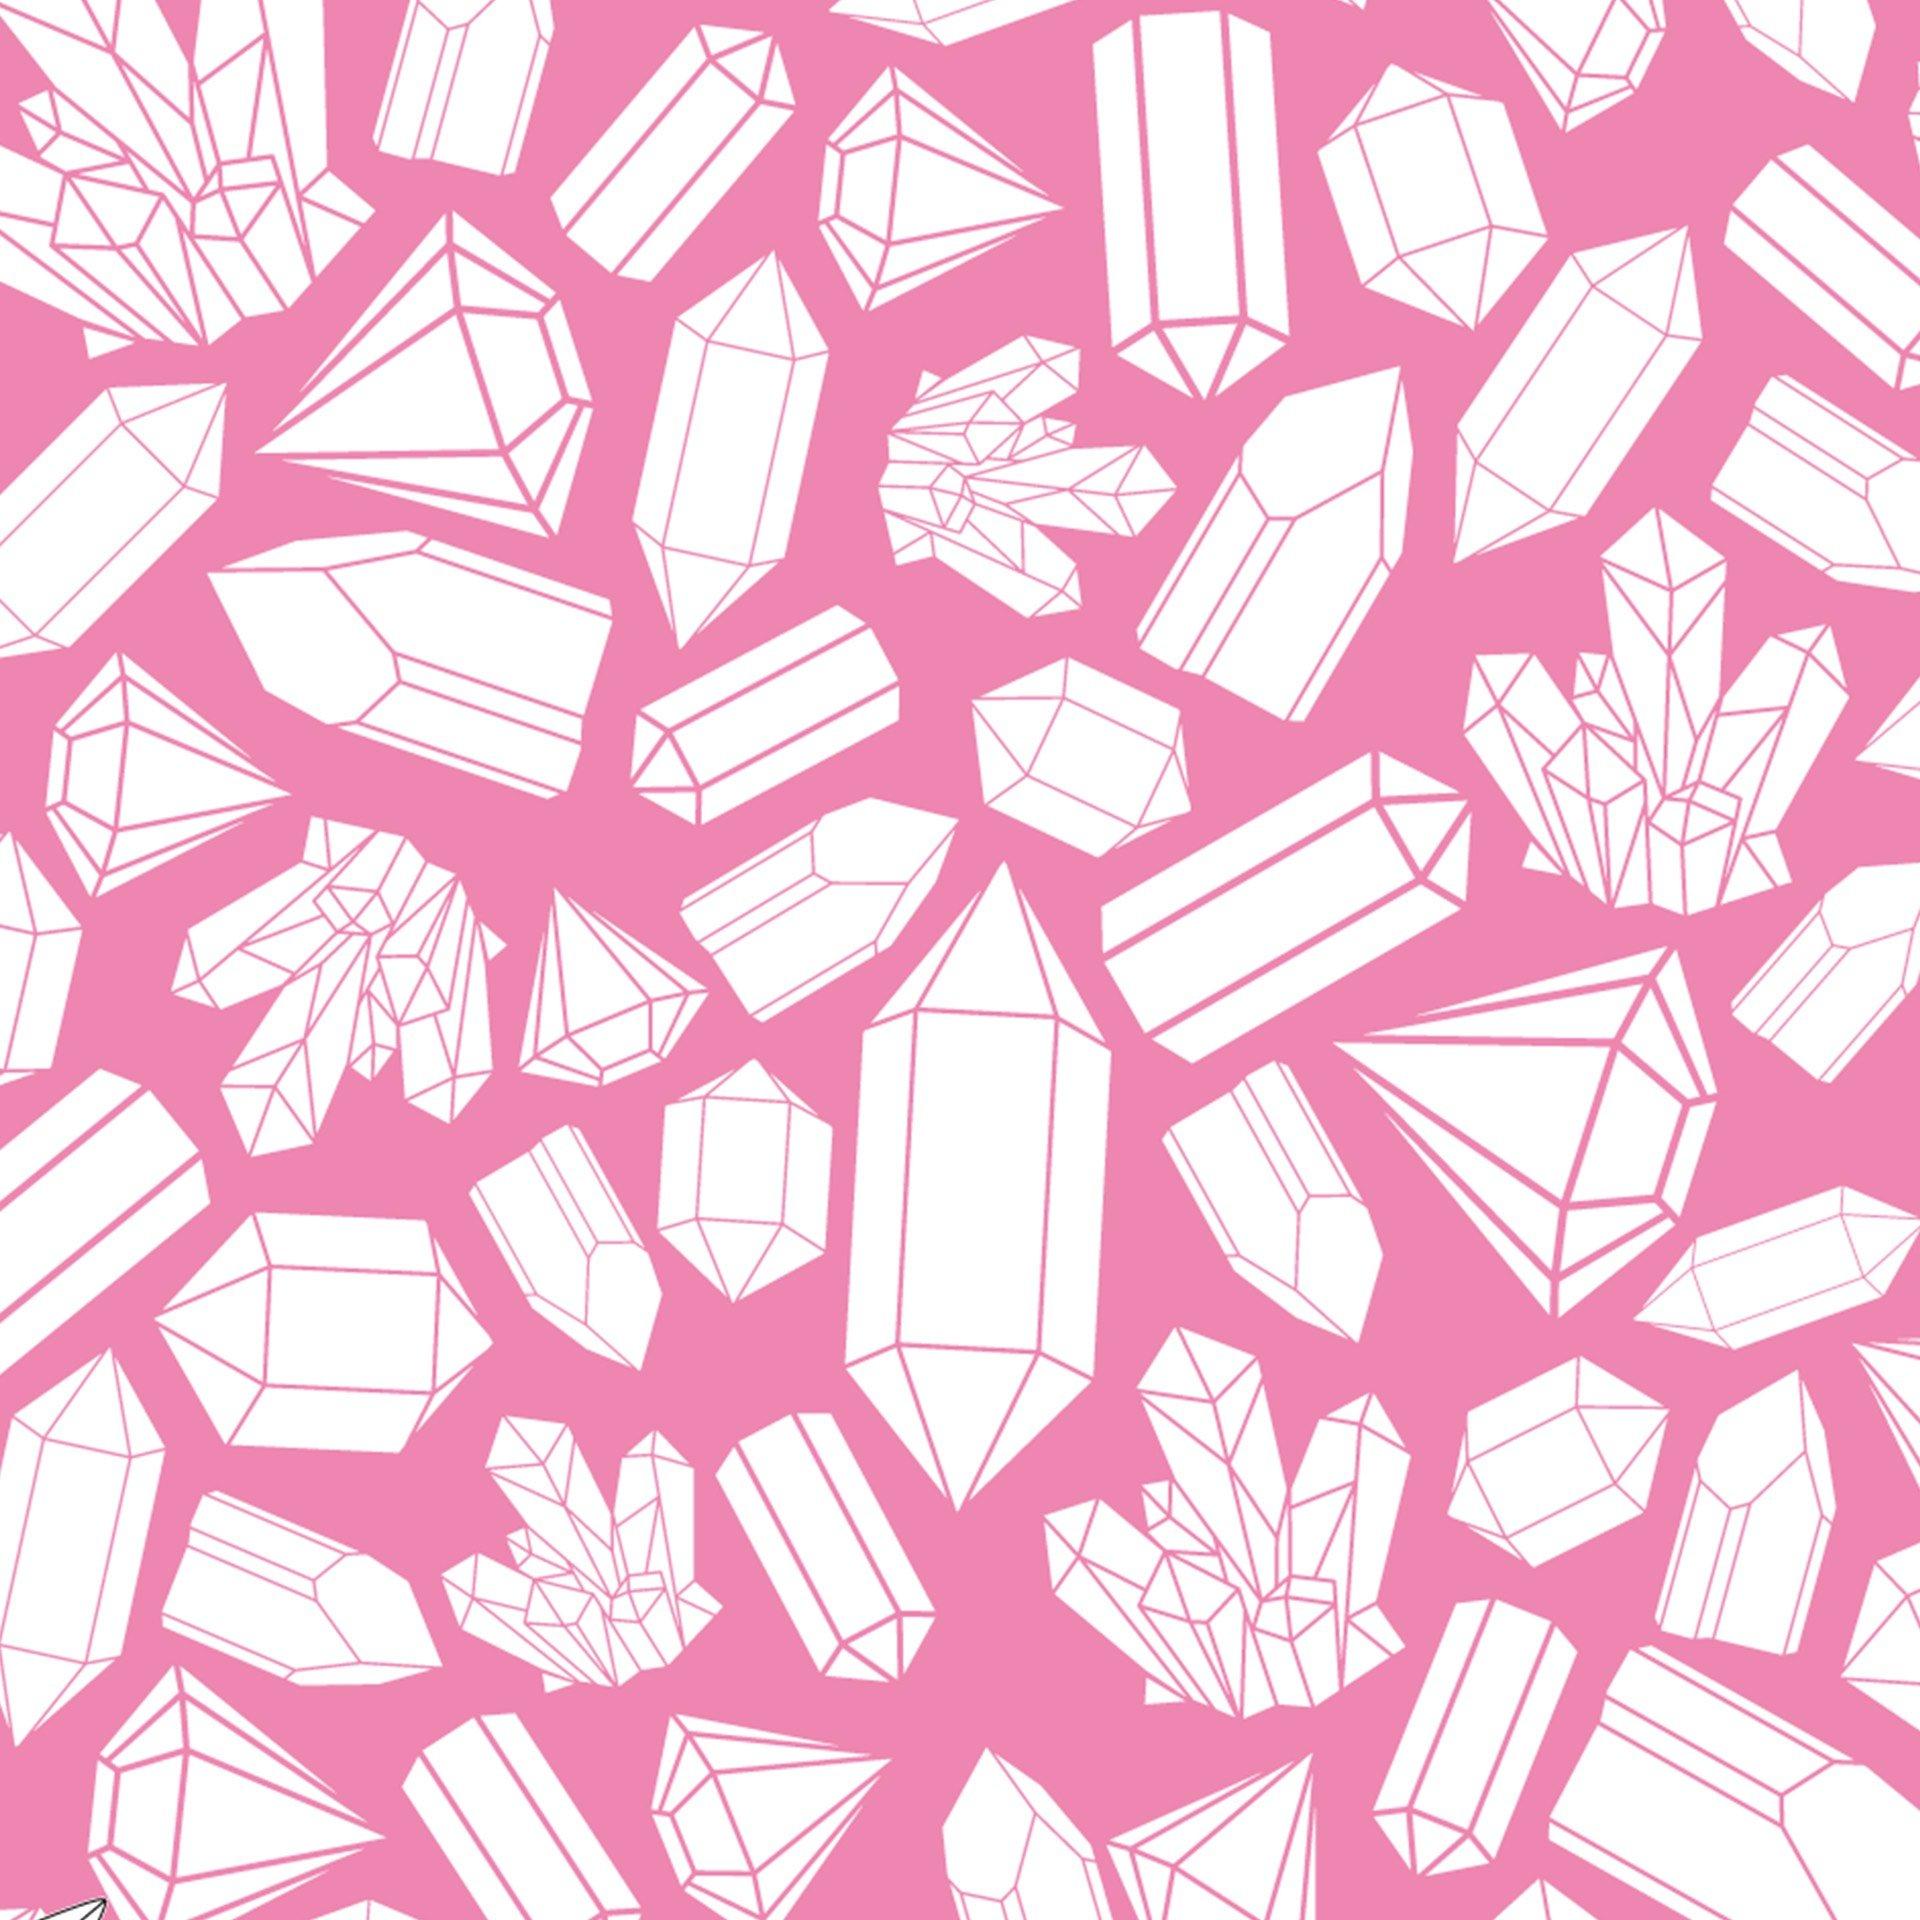 graphic regarding Printable Pattern Paper known as Crystal Behavior Printable Origami Paper